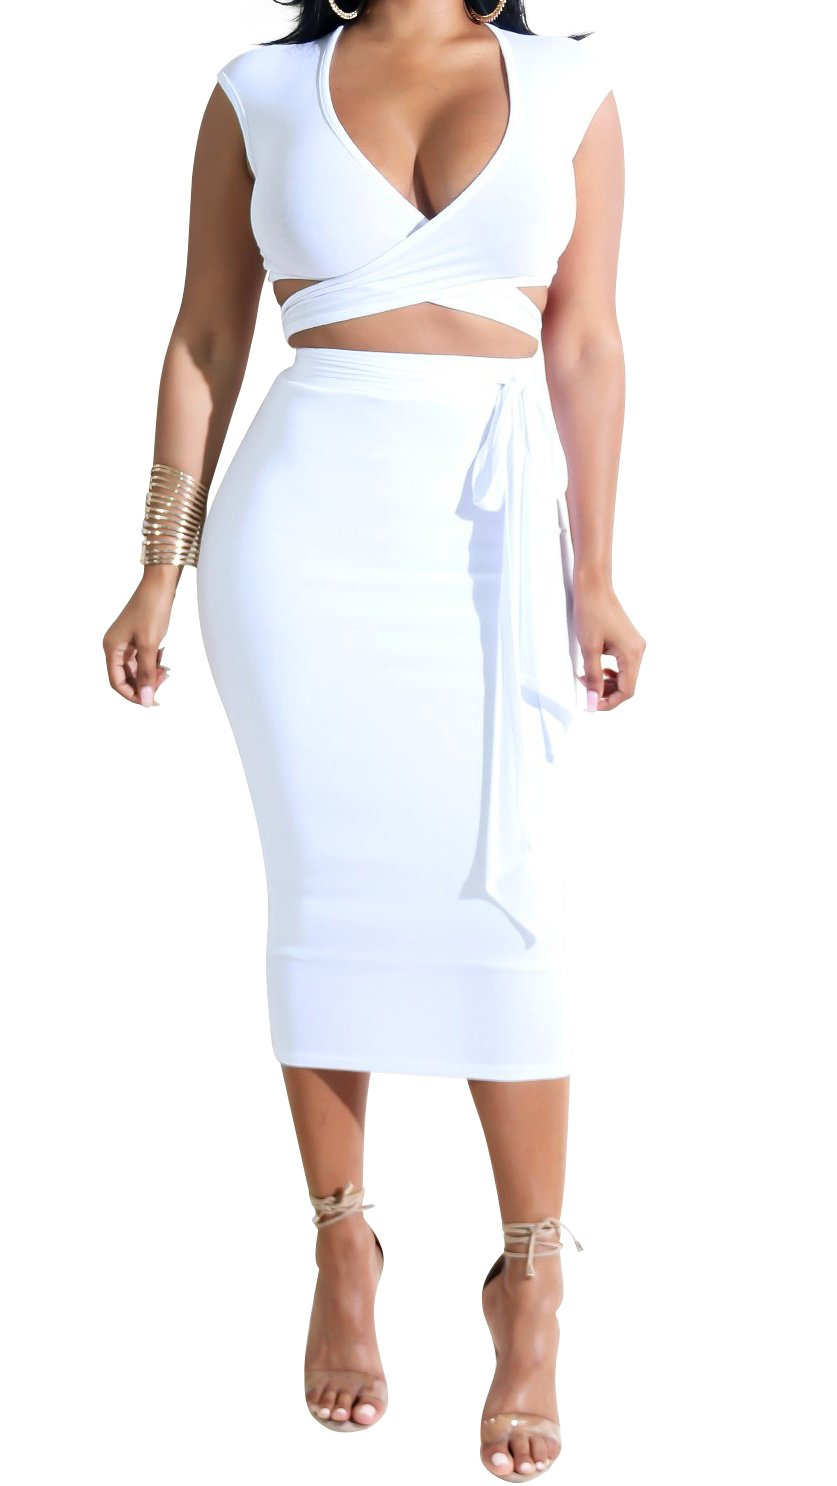 Bodycon4U Women's Clubwear Summer Ruffle Crop Top Two Piece Outfit Bandage Bodycon Midi Dresses White XL